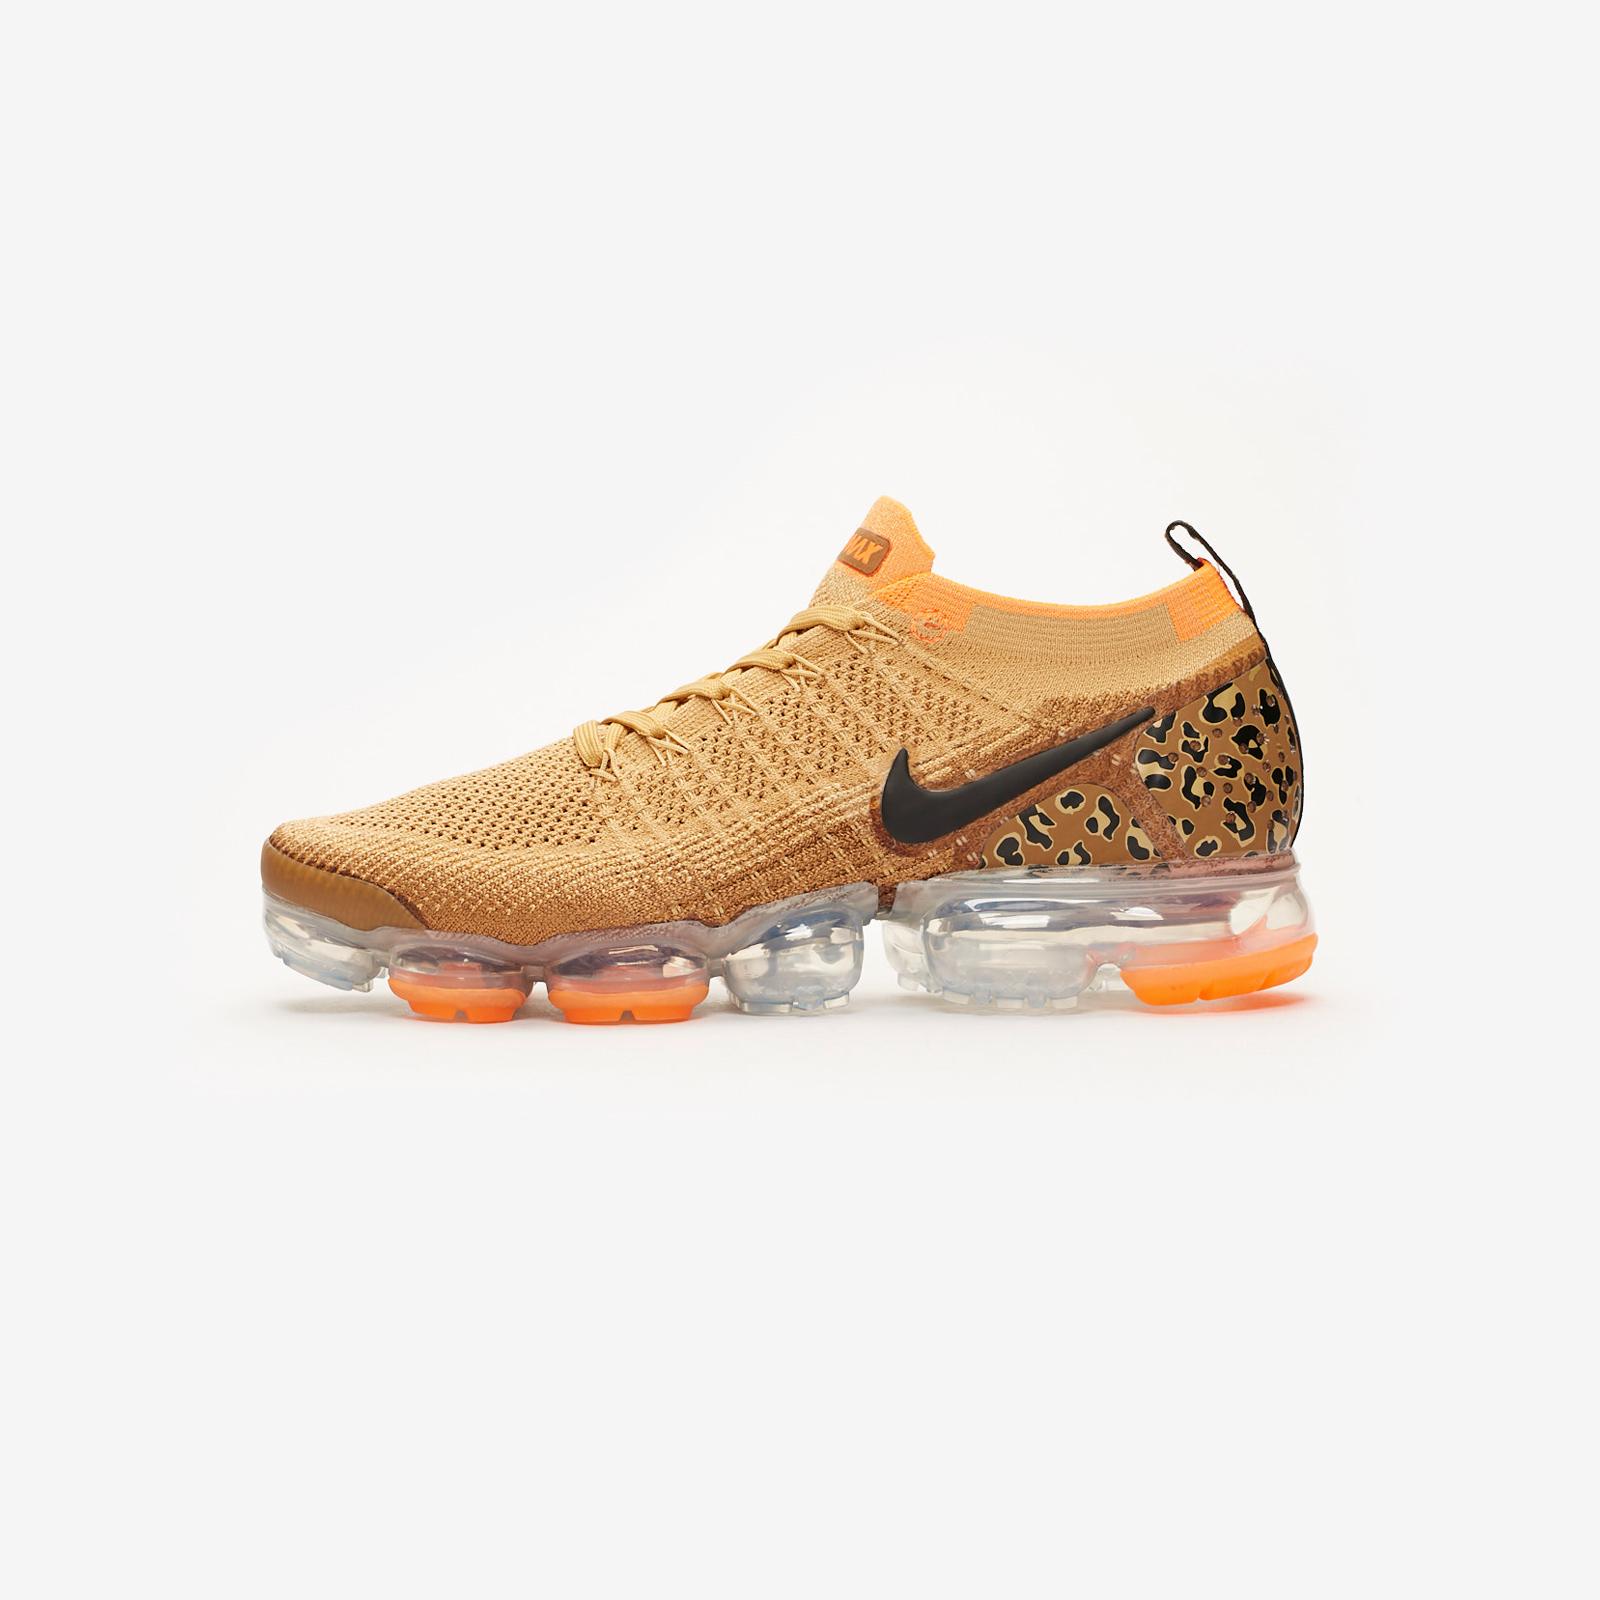 c22c9c5a2c16 Nike Air Vapormax Flyknit 2 - Av7973-700 - Sneakersnstuff